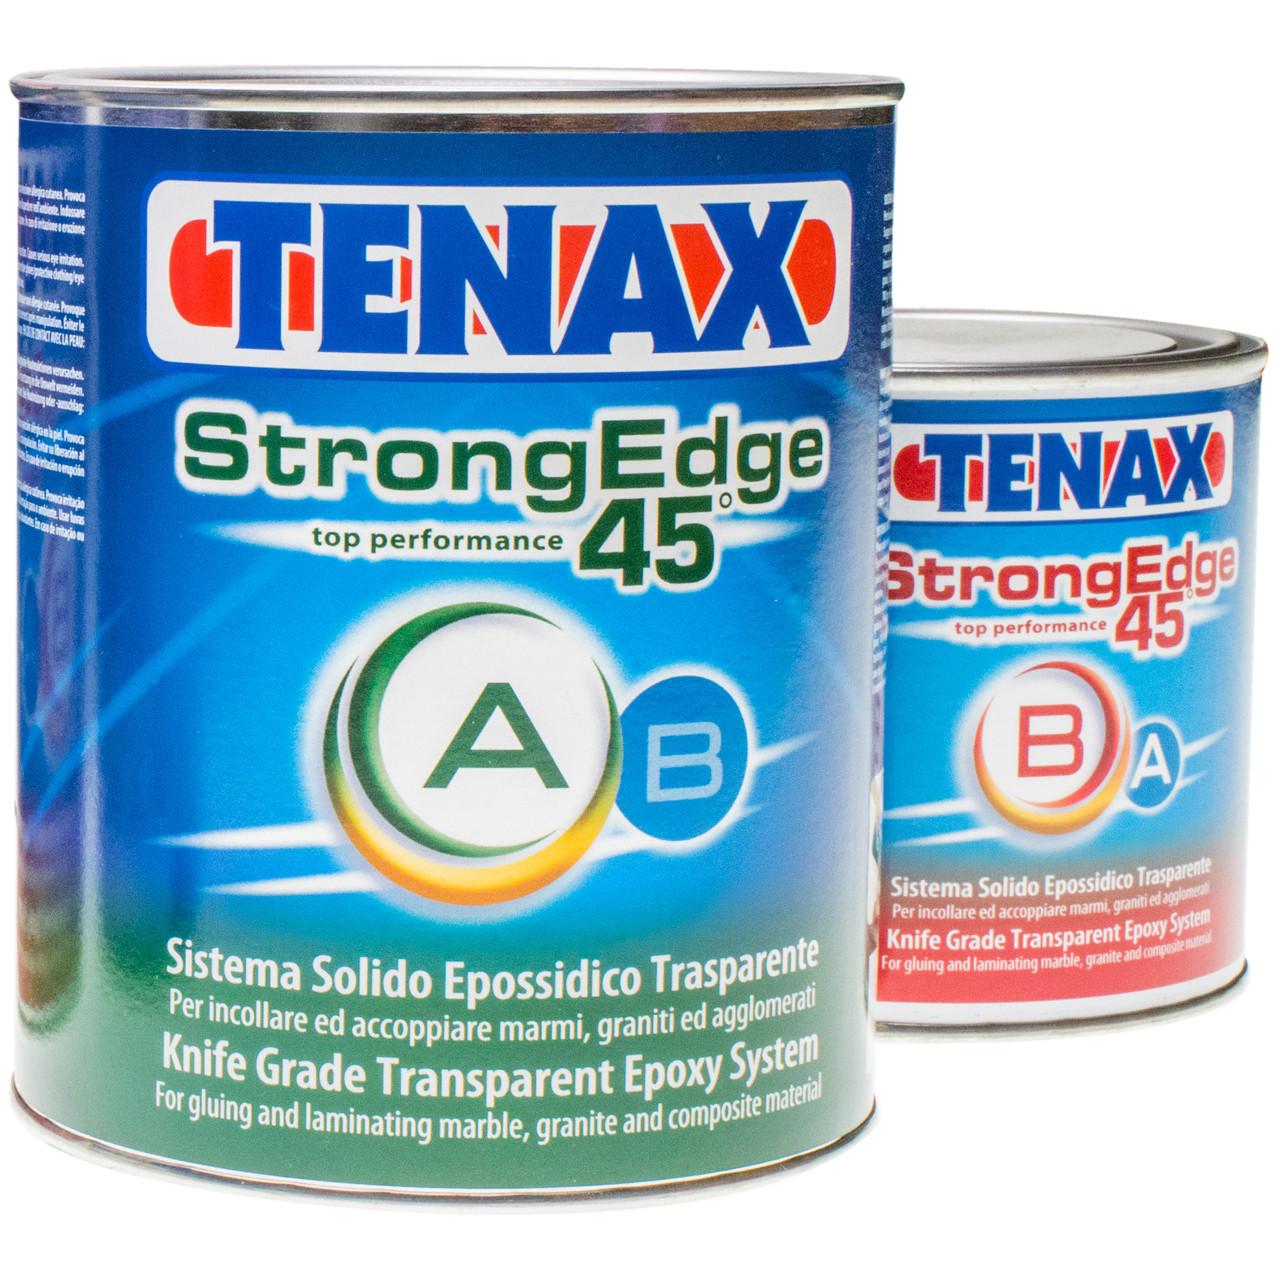 Прозрачный эпоксидный клей для камня StrongEdge 45 A+B (1+0.5 л) TENAX